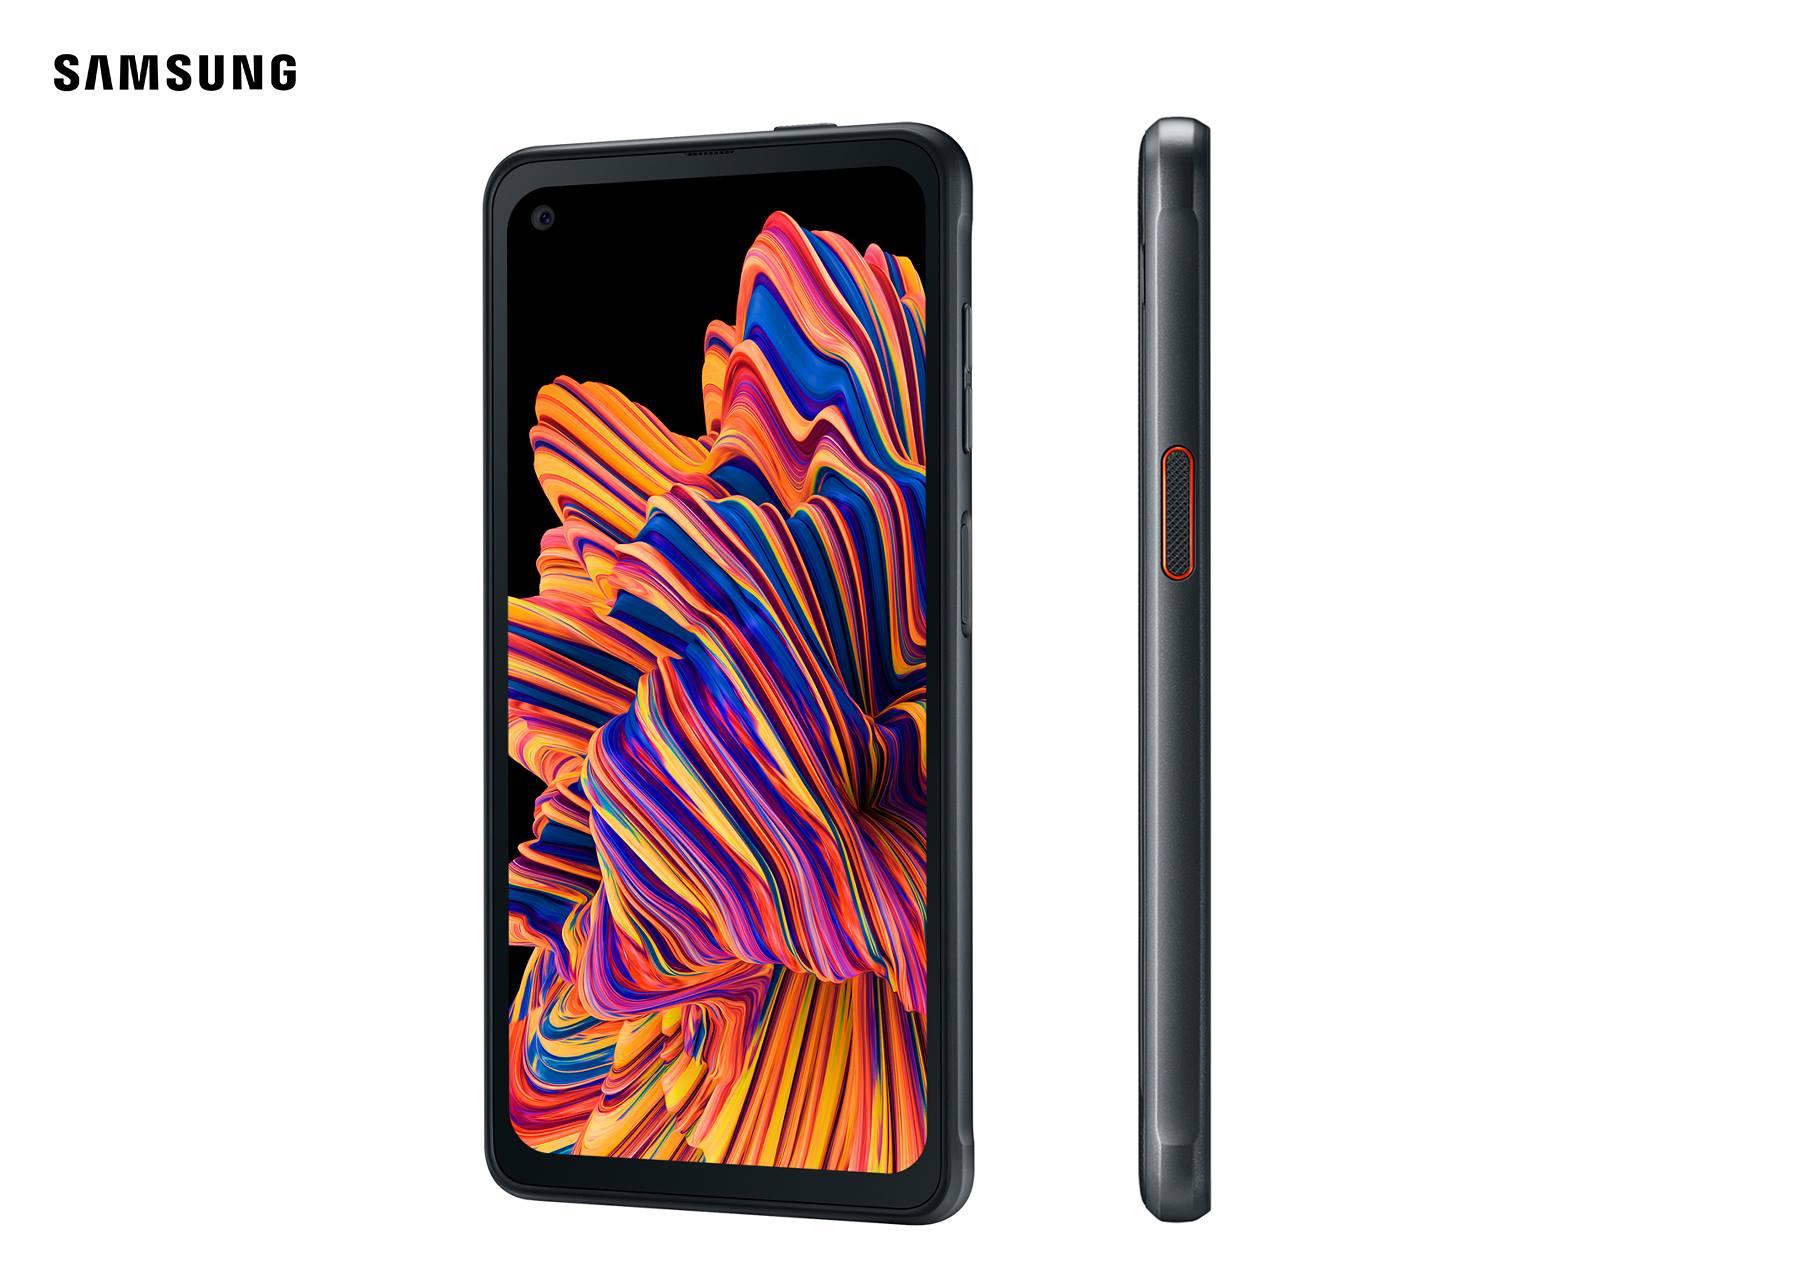 Samsung Galaxy Xcover Pro (2)